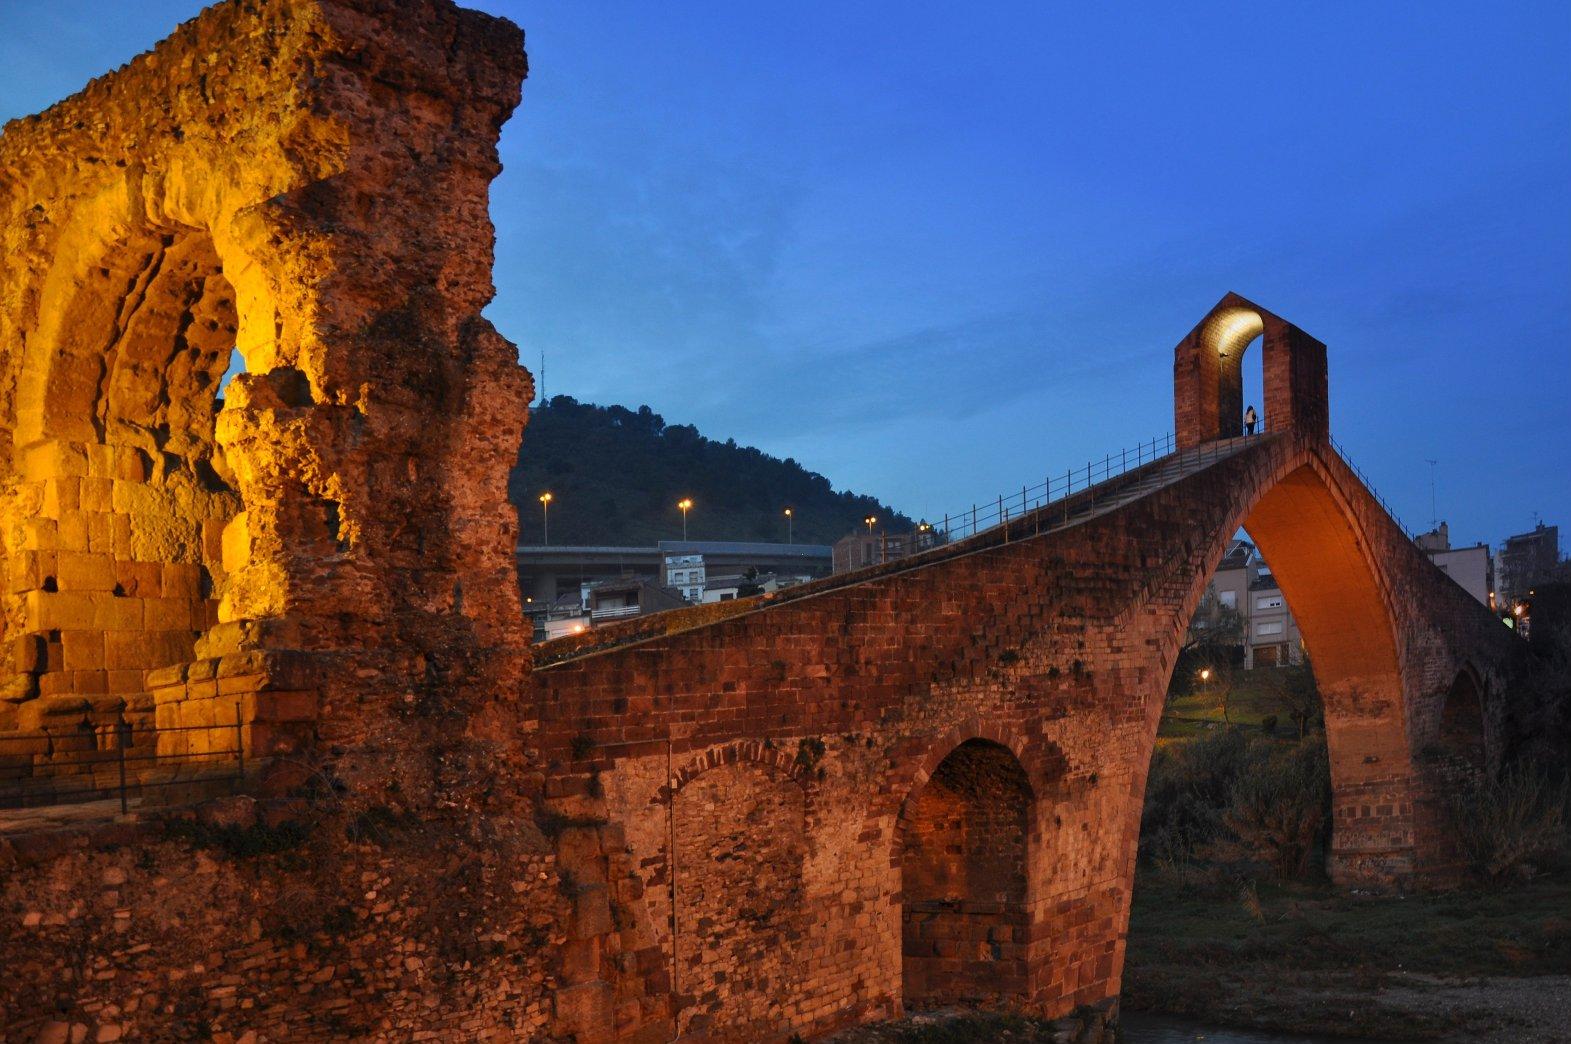 File Puente Del Diablo Martorell Catalonia Spain Pic